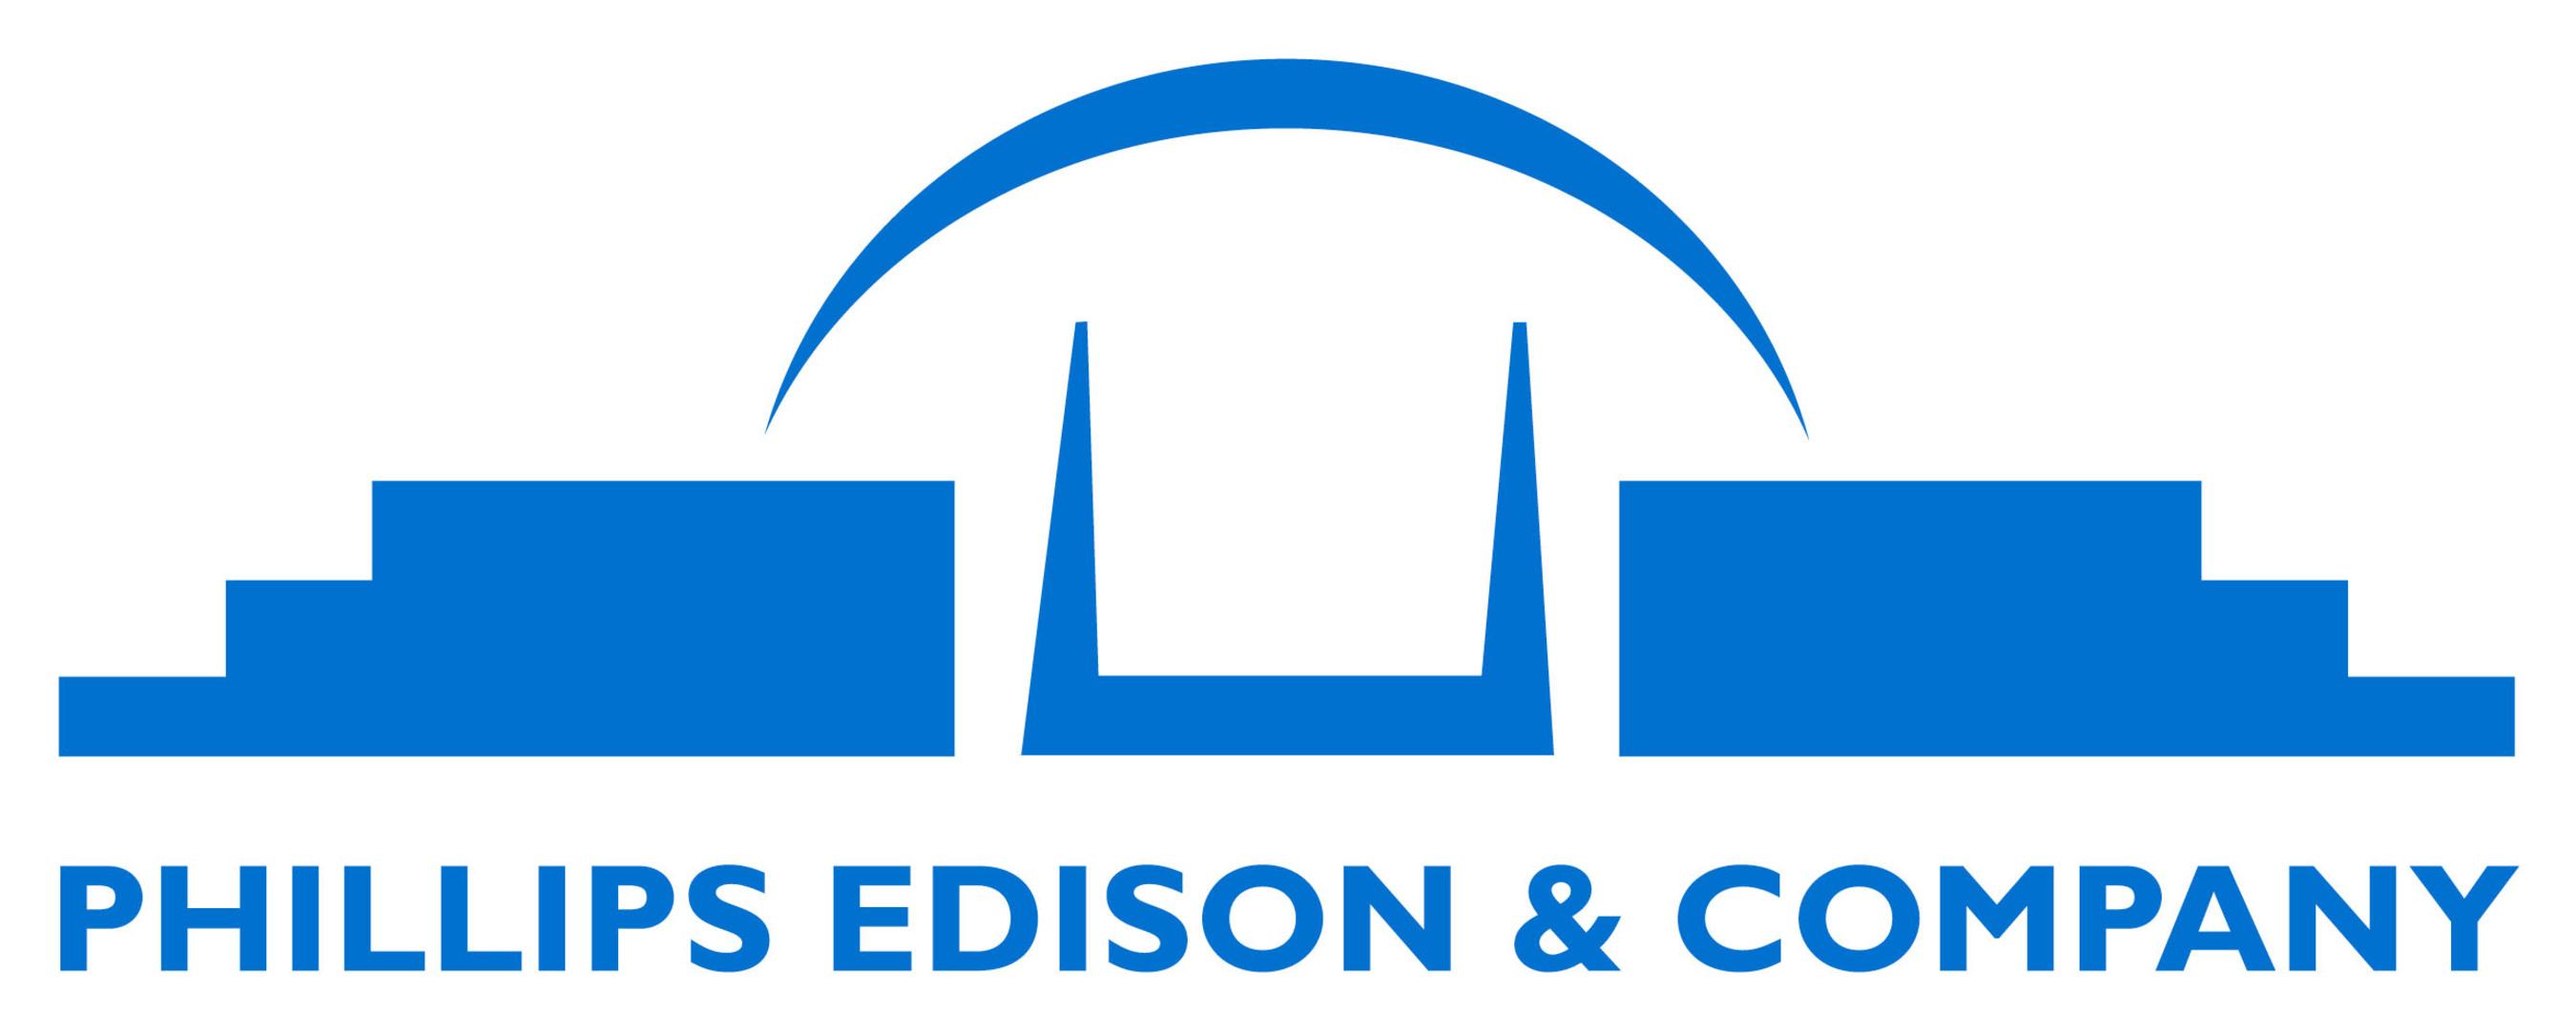 Phillips Edison & Company.